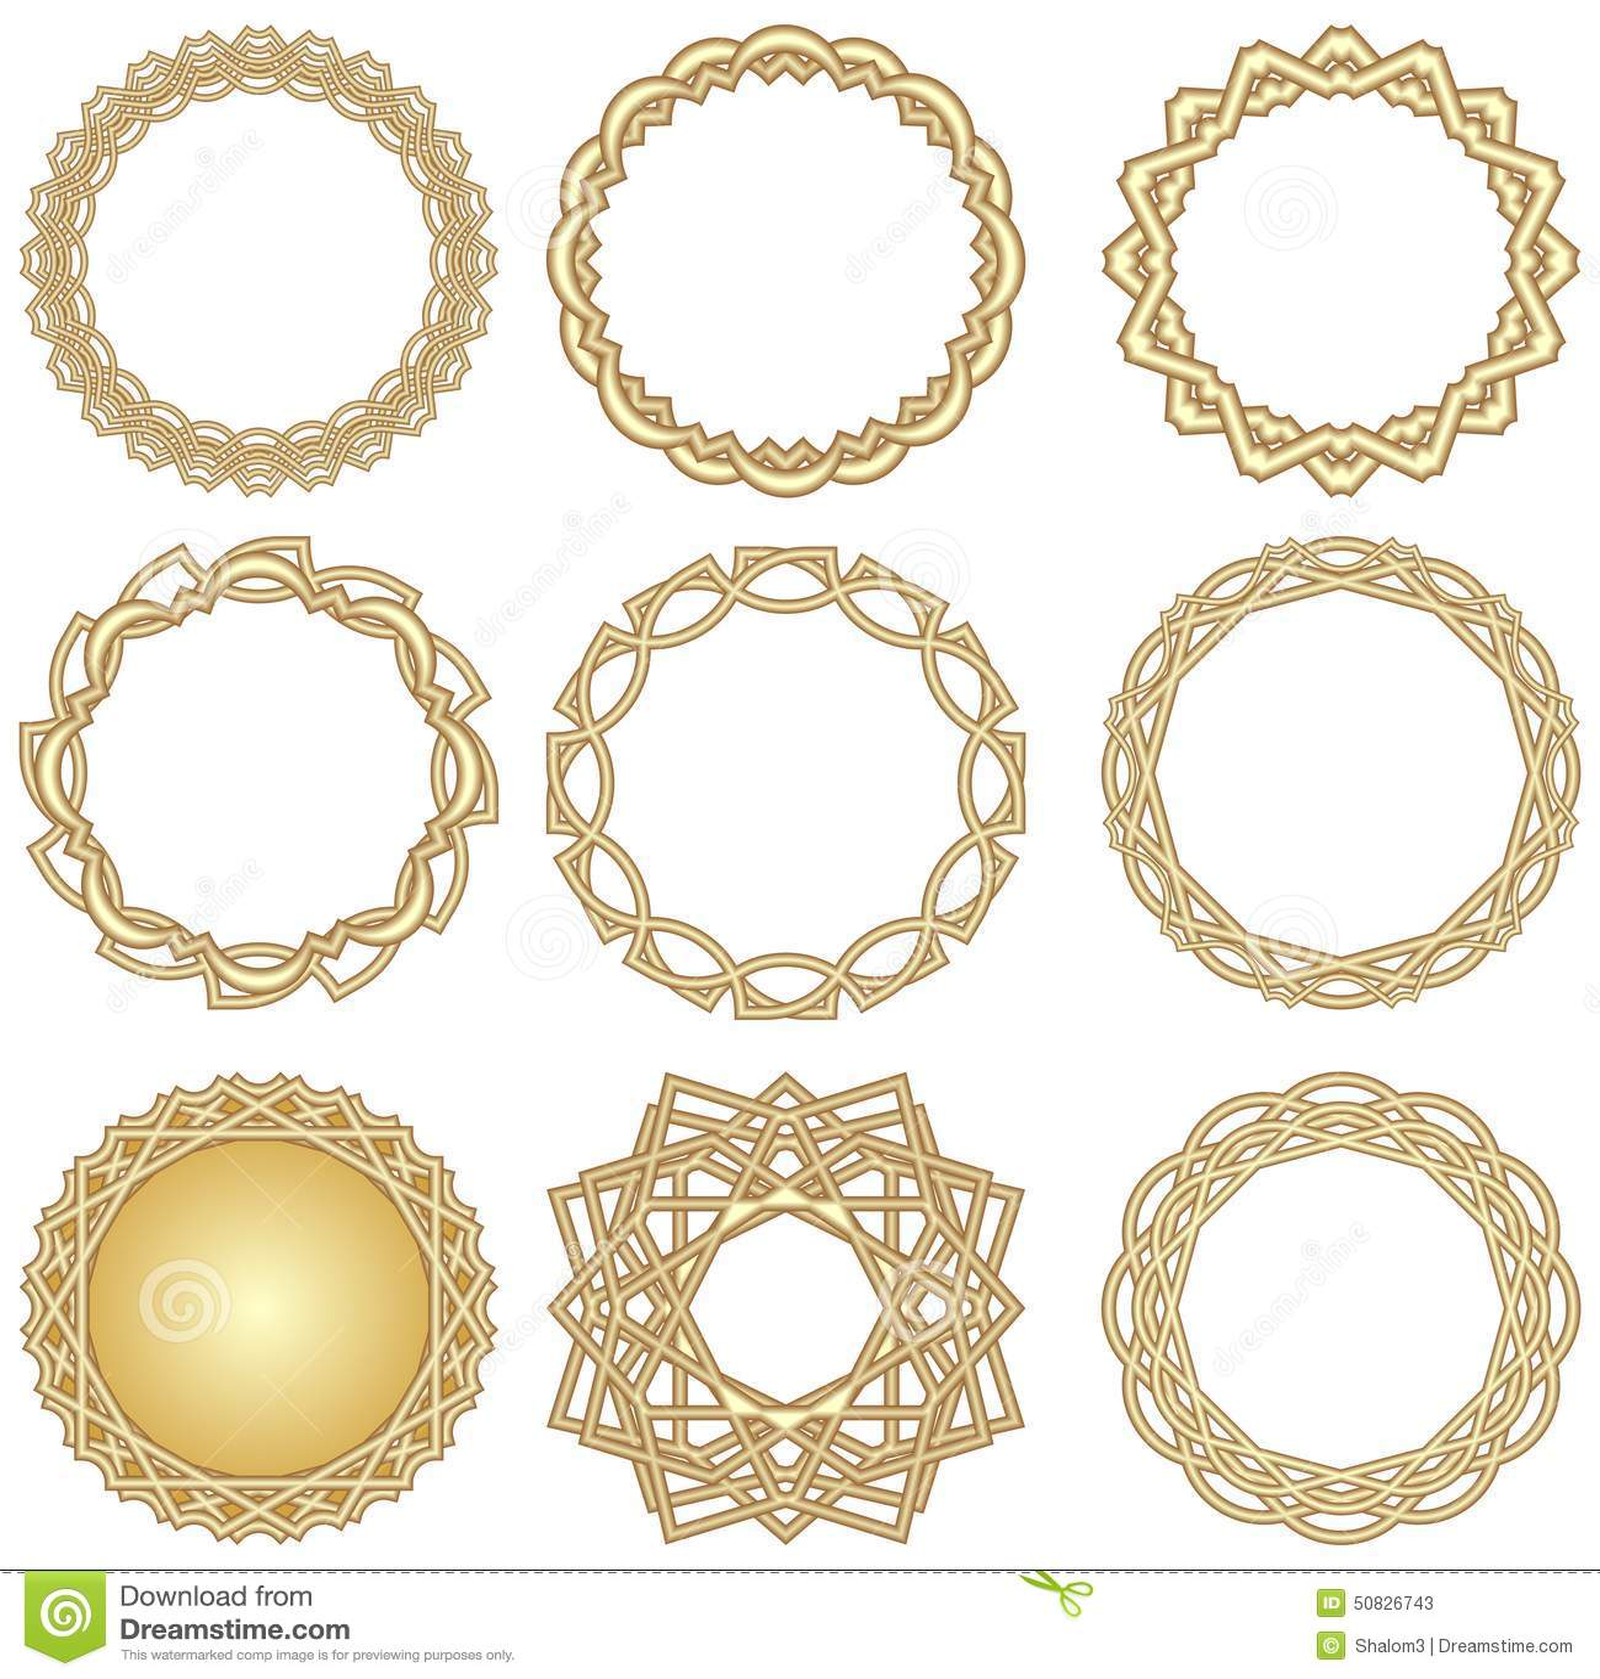 Circle Design Art : A set of golden decorative circle frames in art deco style